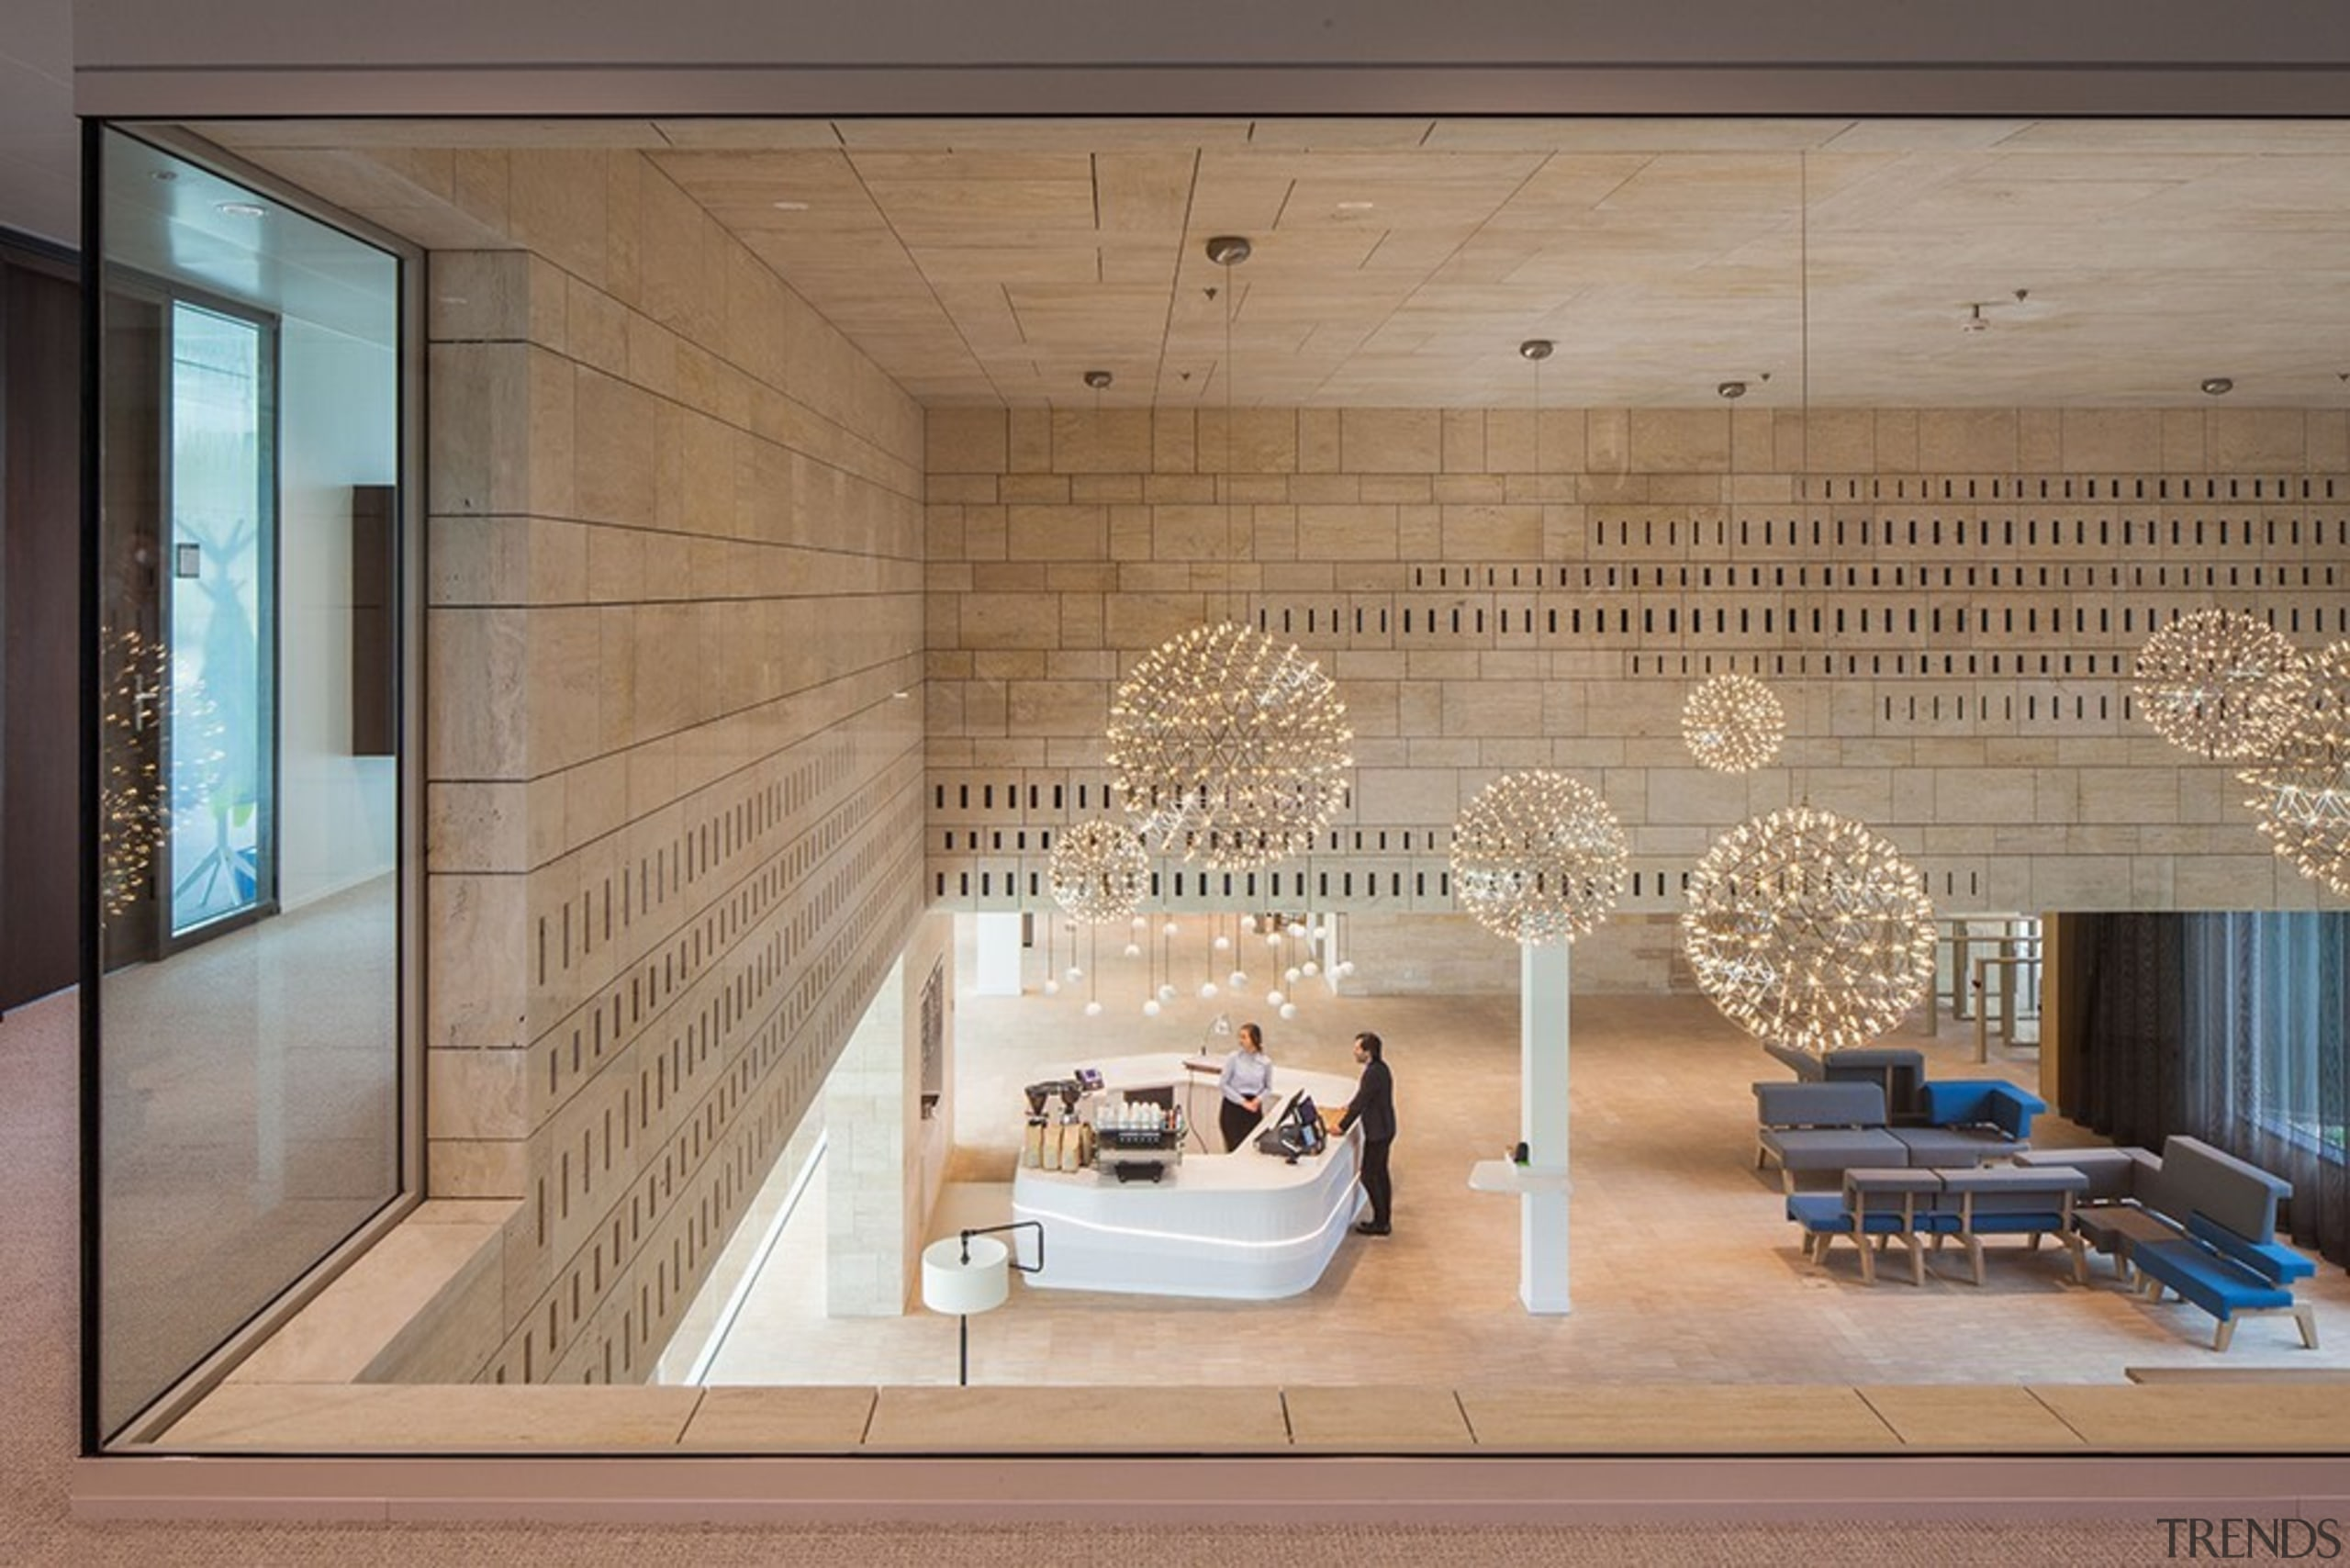 Eurojust - architecture | daylighting | house | architecture, daylighting, house, interior design, wood, brown, gray